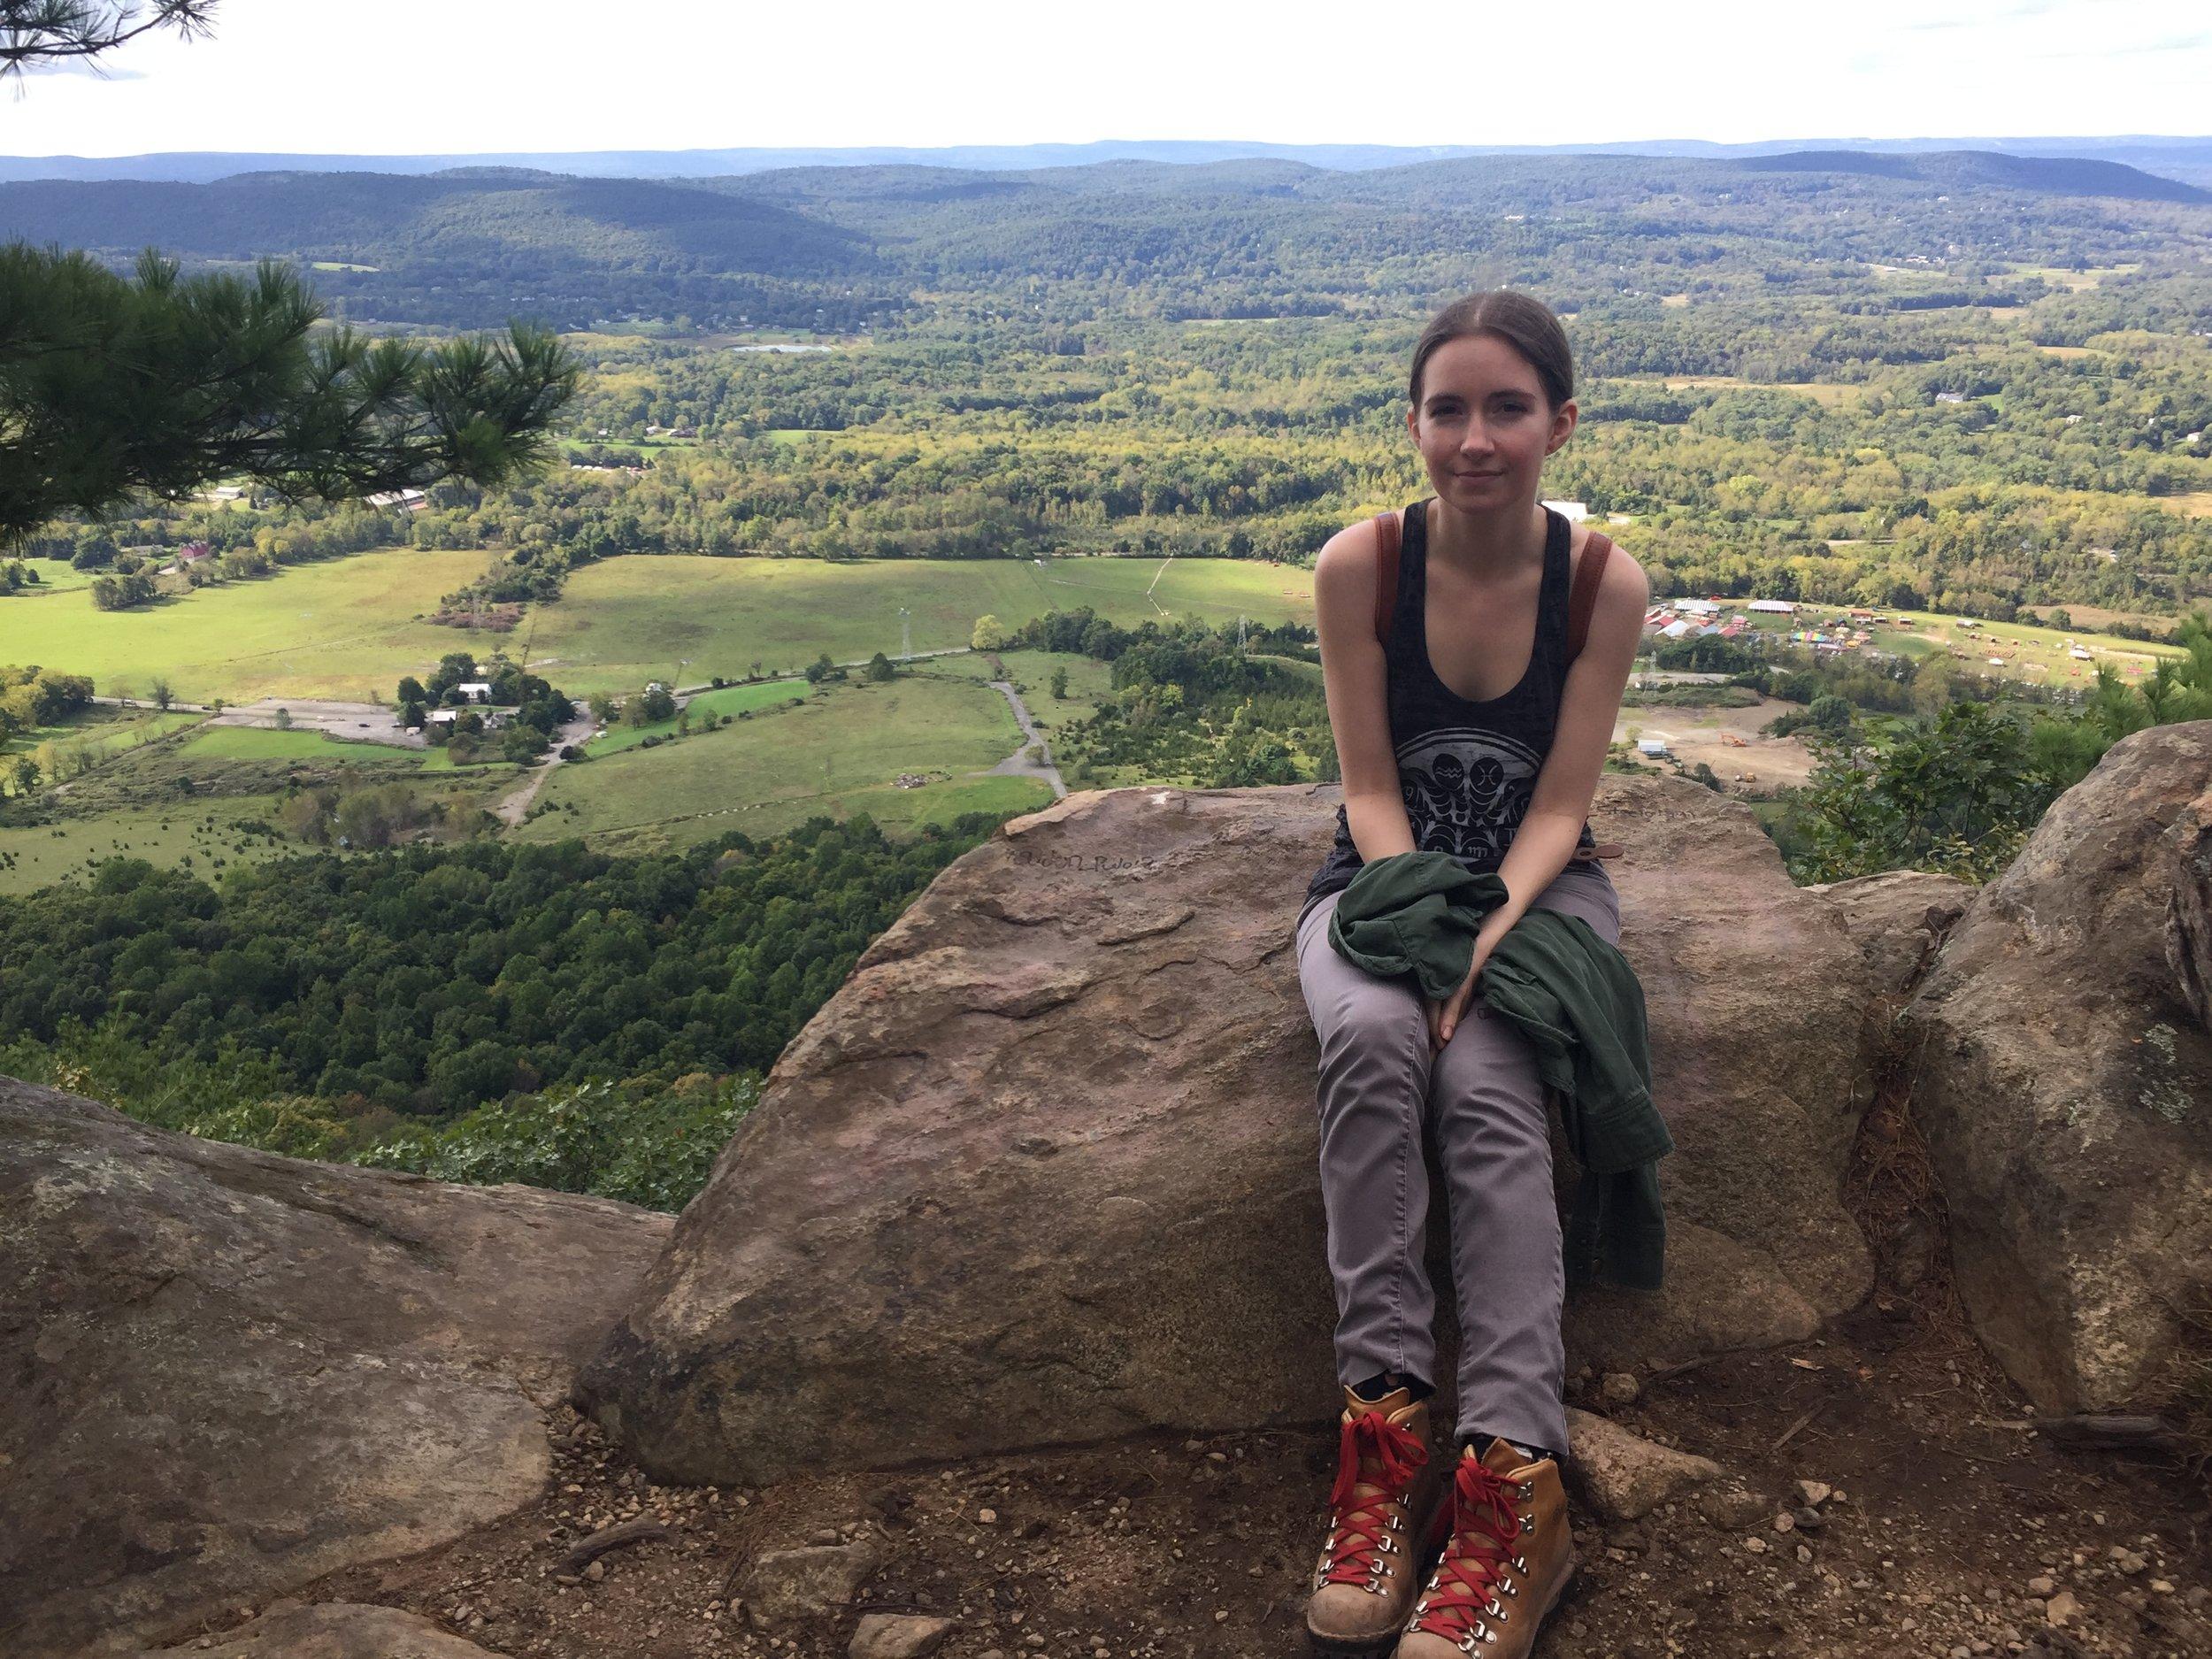 Joan Pope at Pinwheel Vista on Appalachian Trail